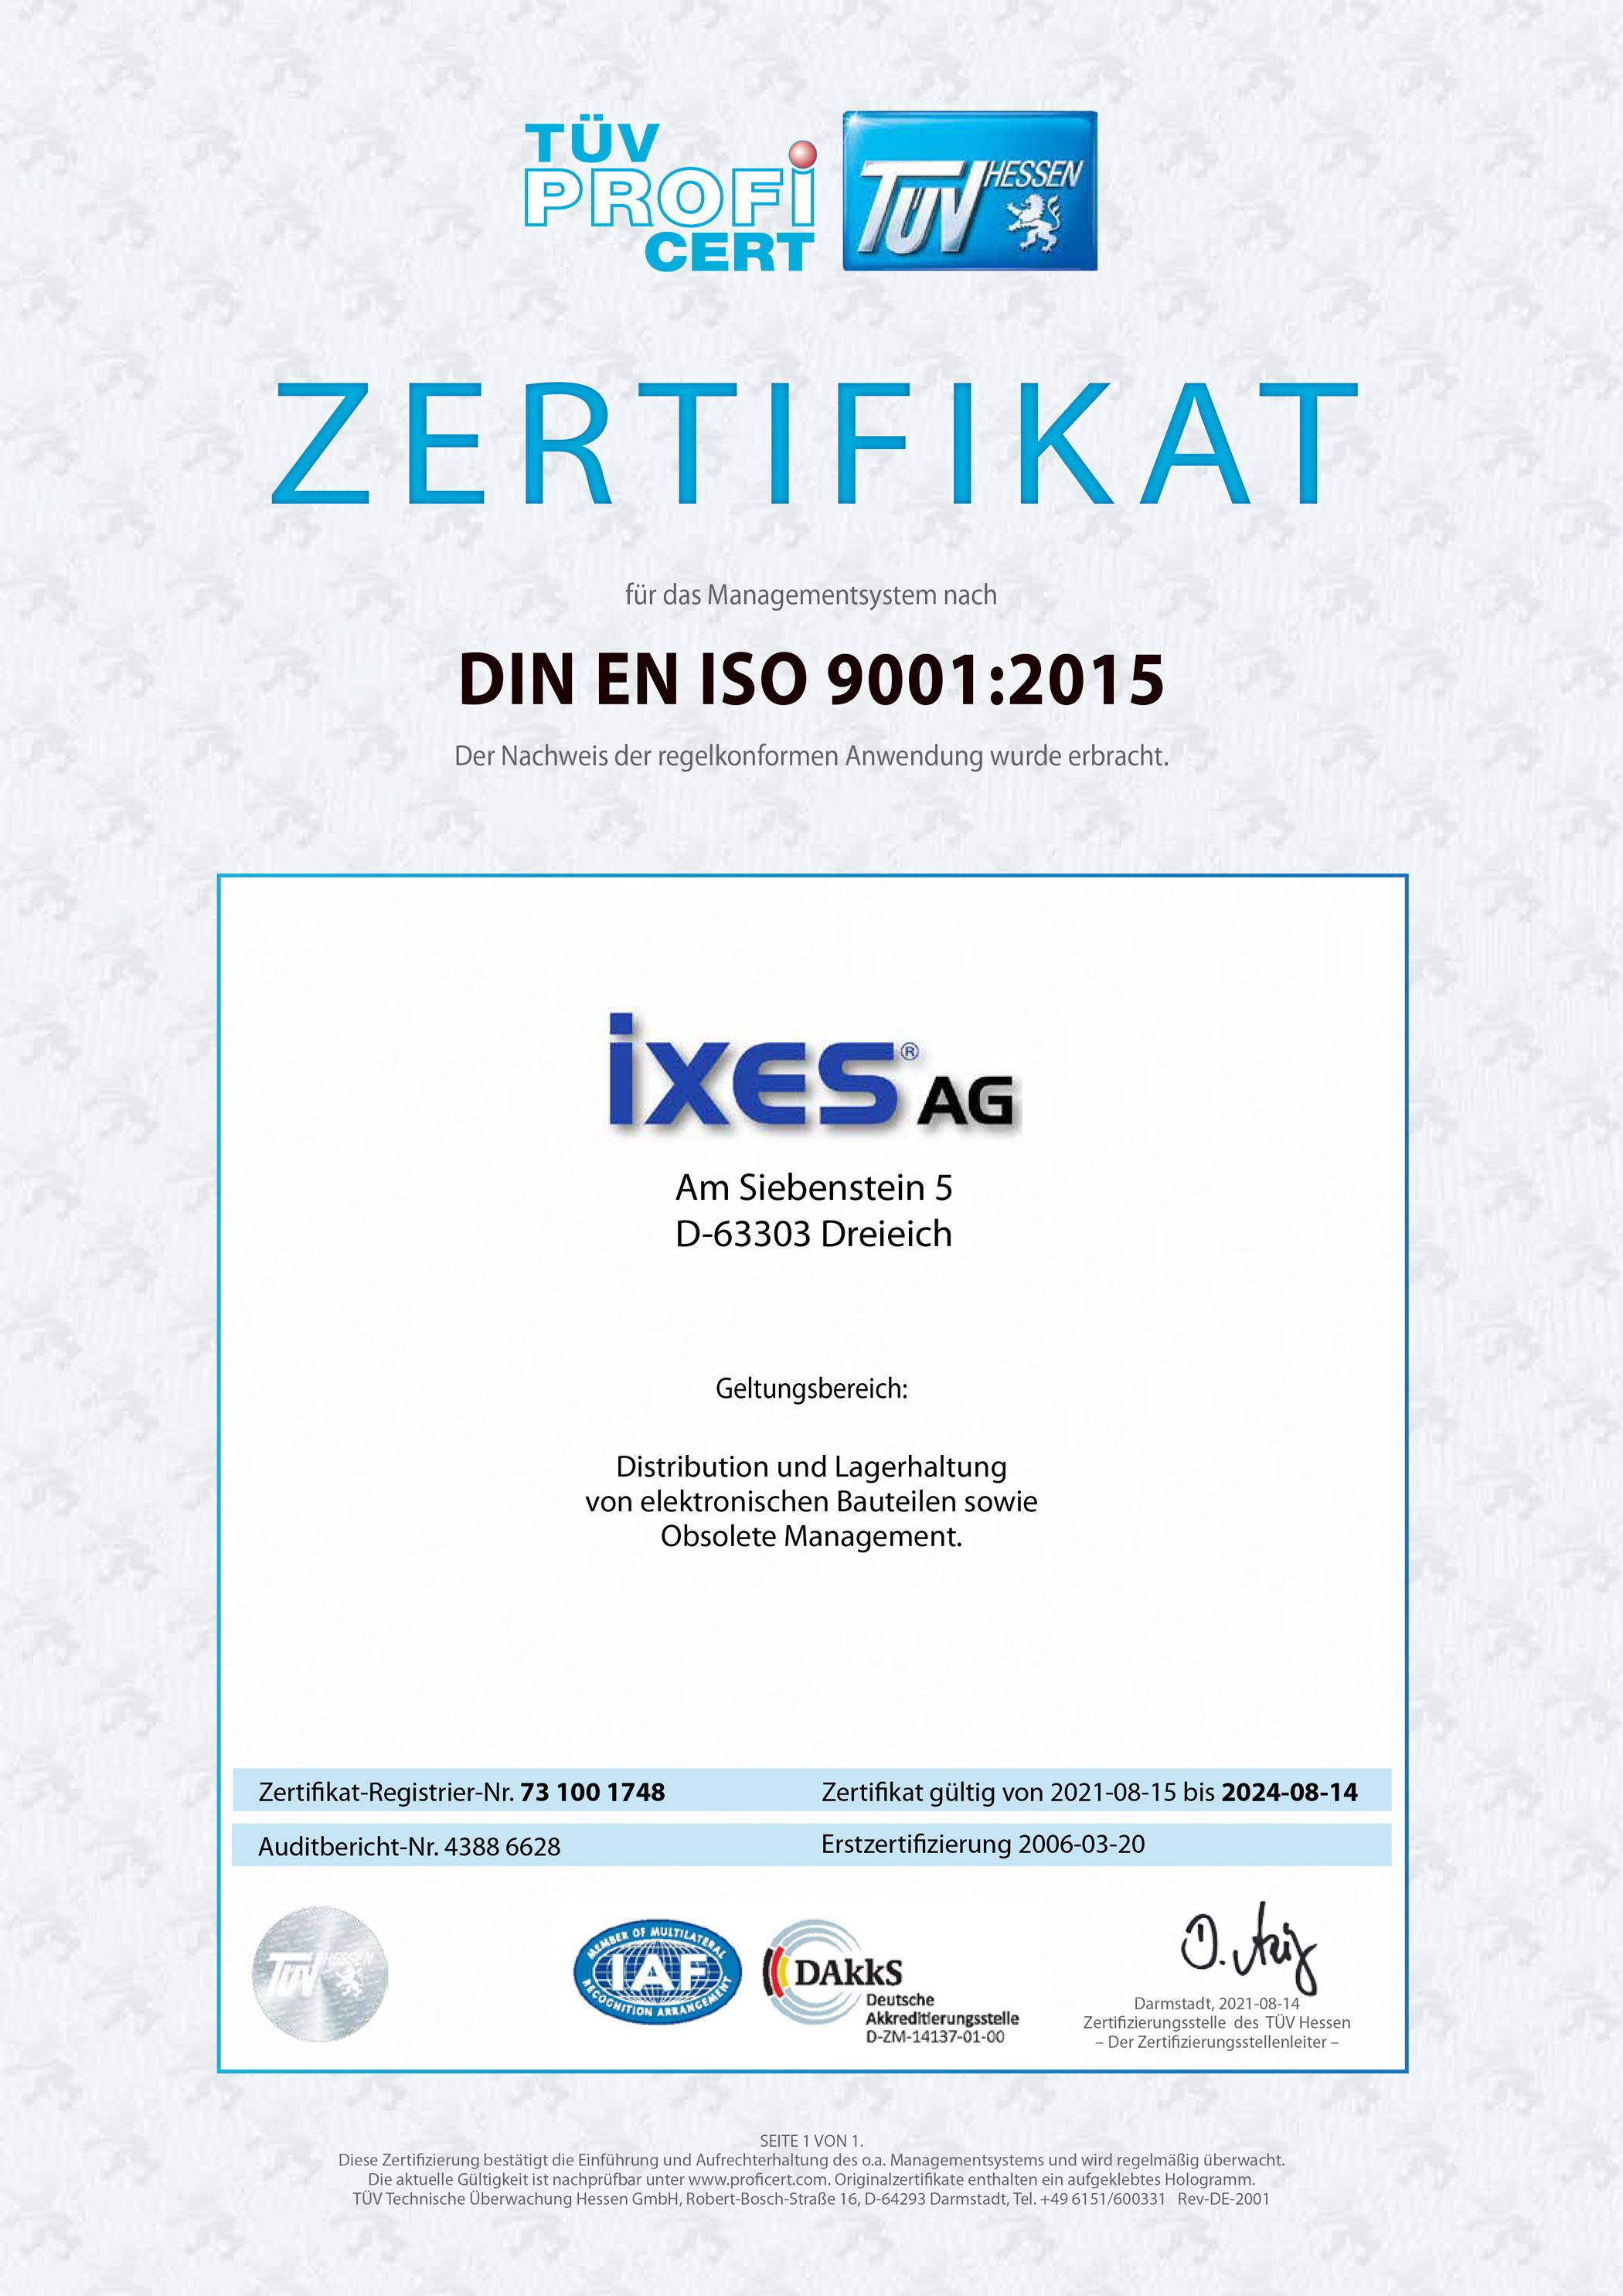 ixes AG ISO Zertifikat 2021 DIN EN ISO 9001:2015